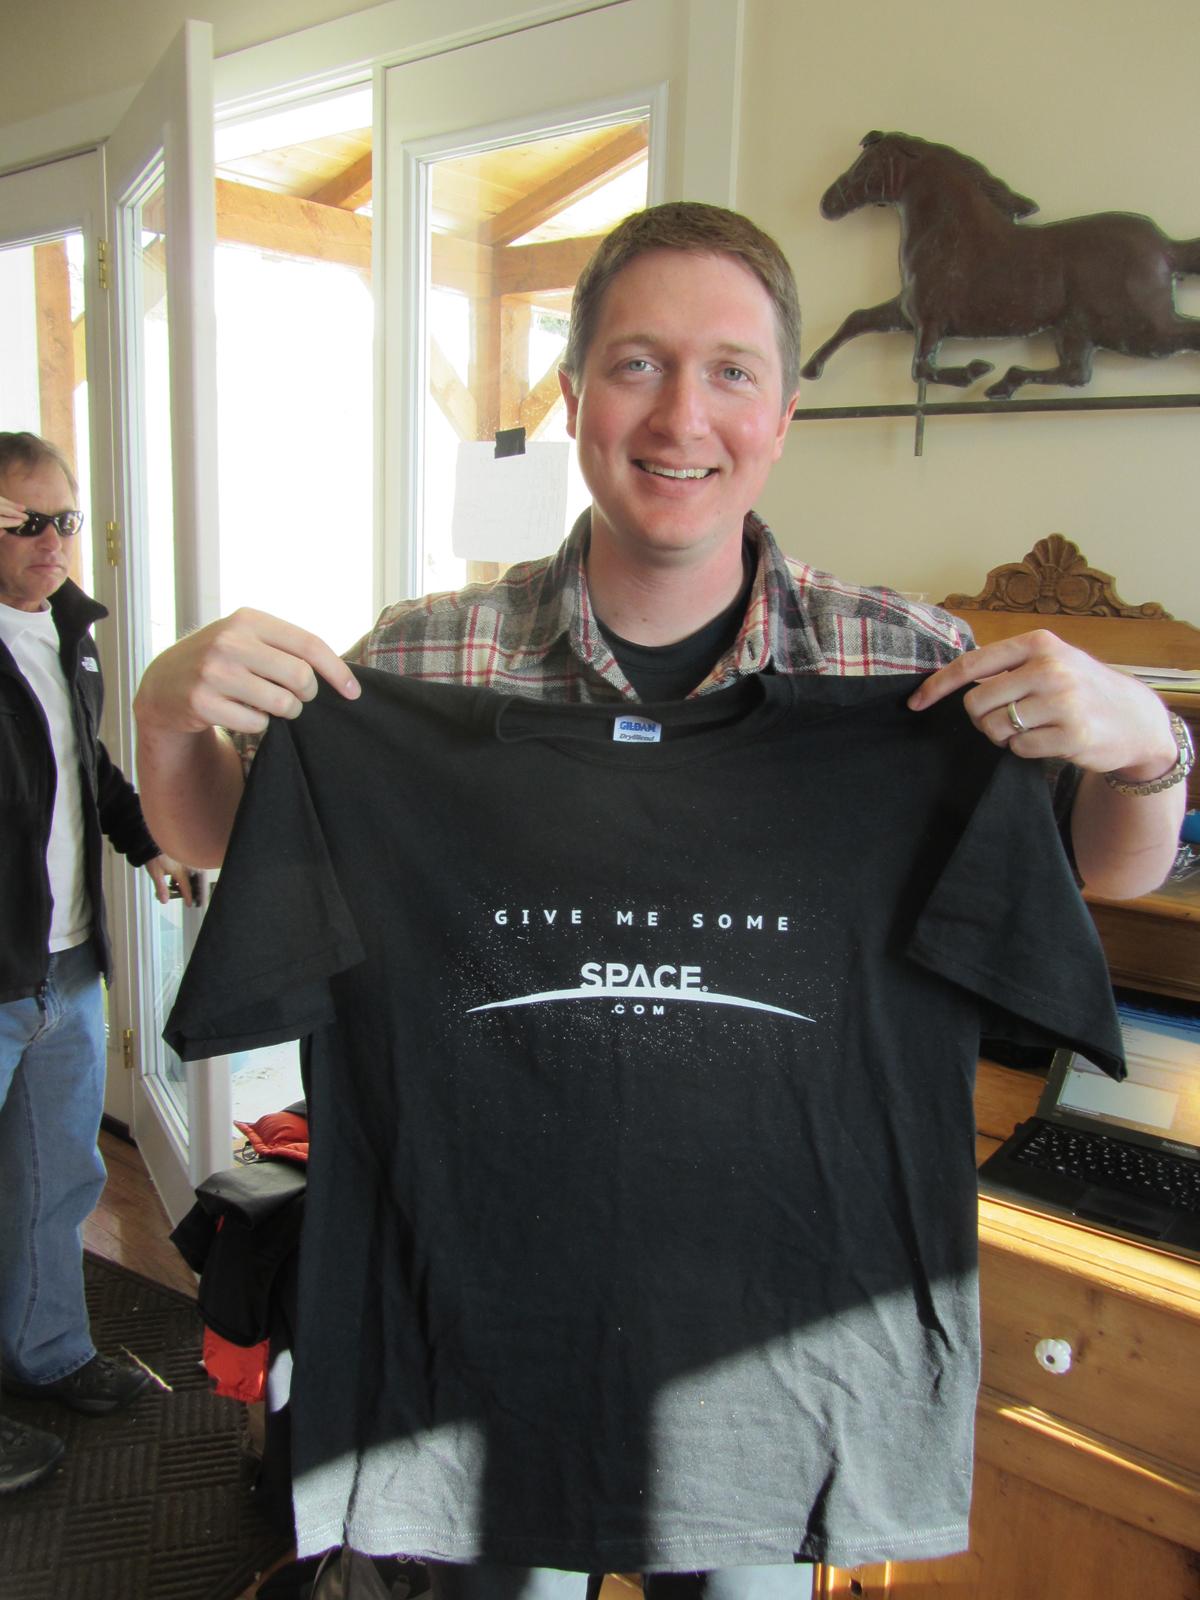 SPACE.com T-shirt Kisses Edge of Alaska's Northern Lights